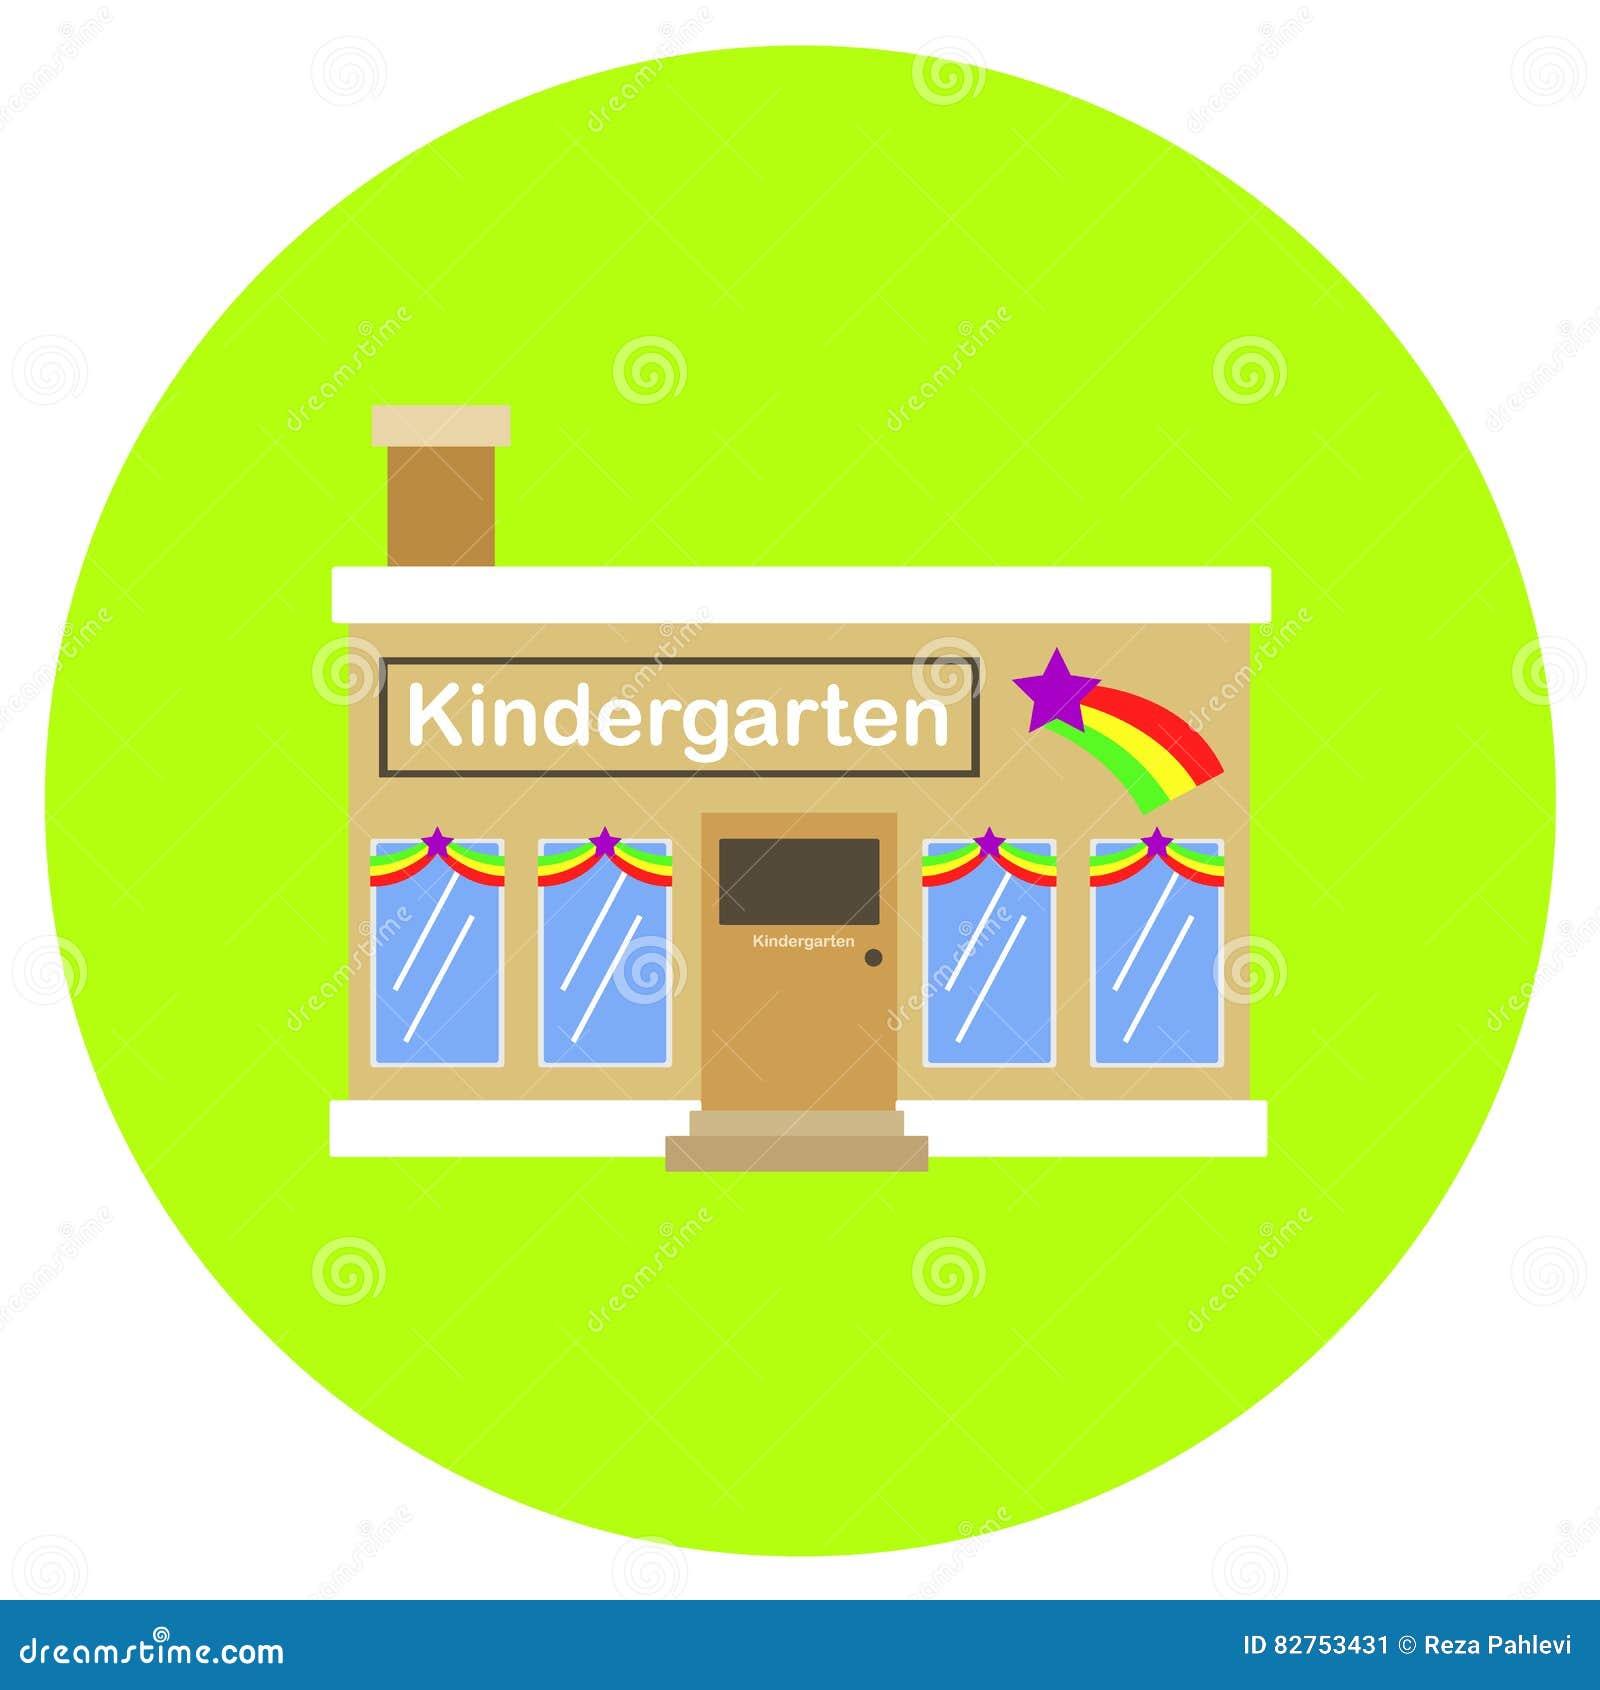 Kindergarten icon in trendy flat style isolated on grey background kindergarten icon in trendy flat style isolated on grey background building symbol for your design logo ui vector illustration biocorpaavc